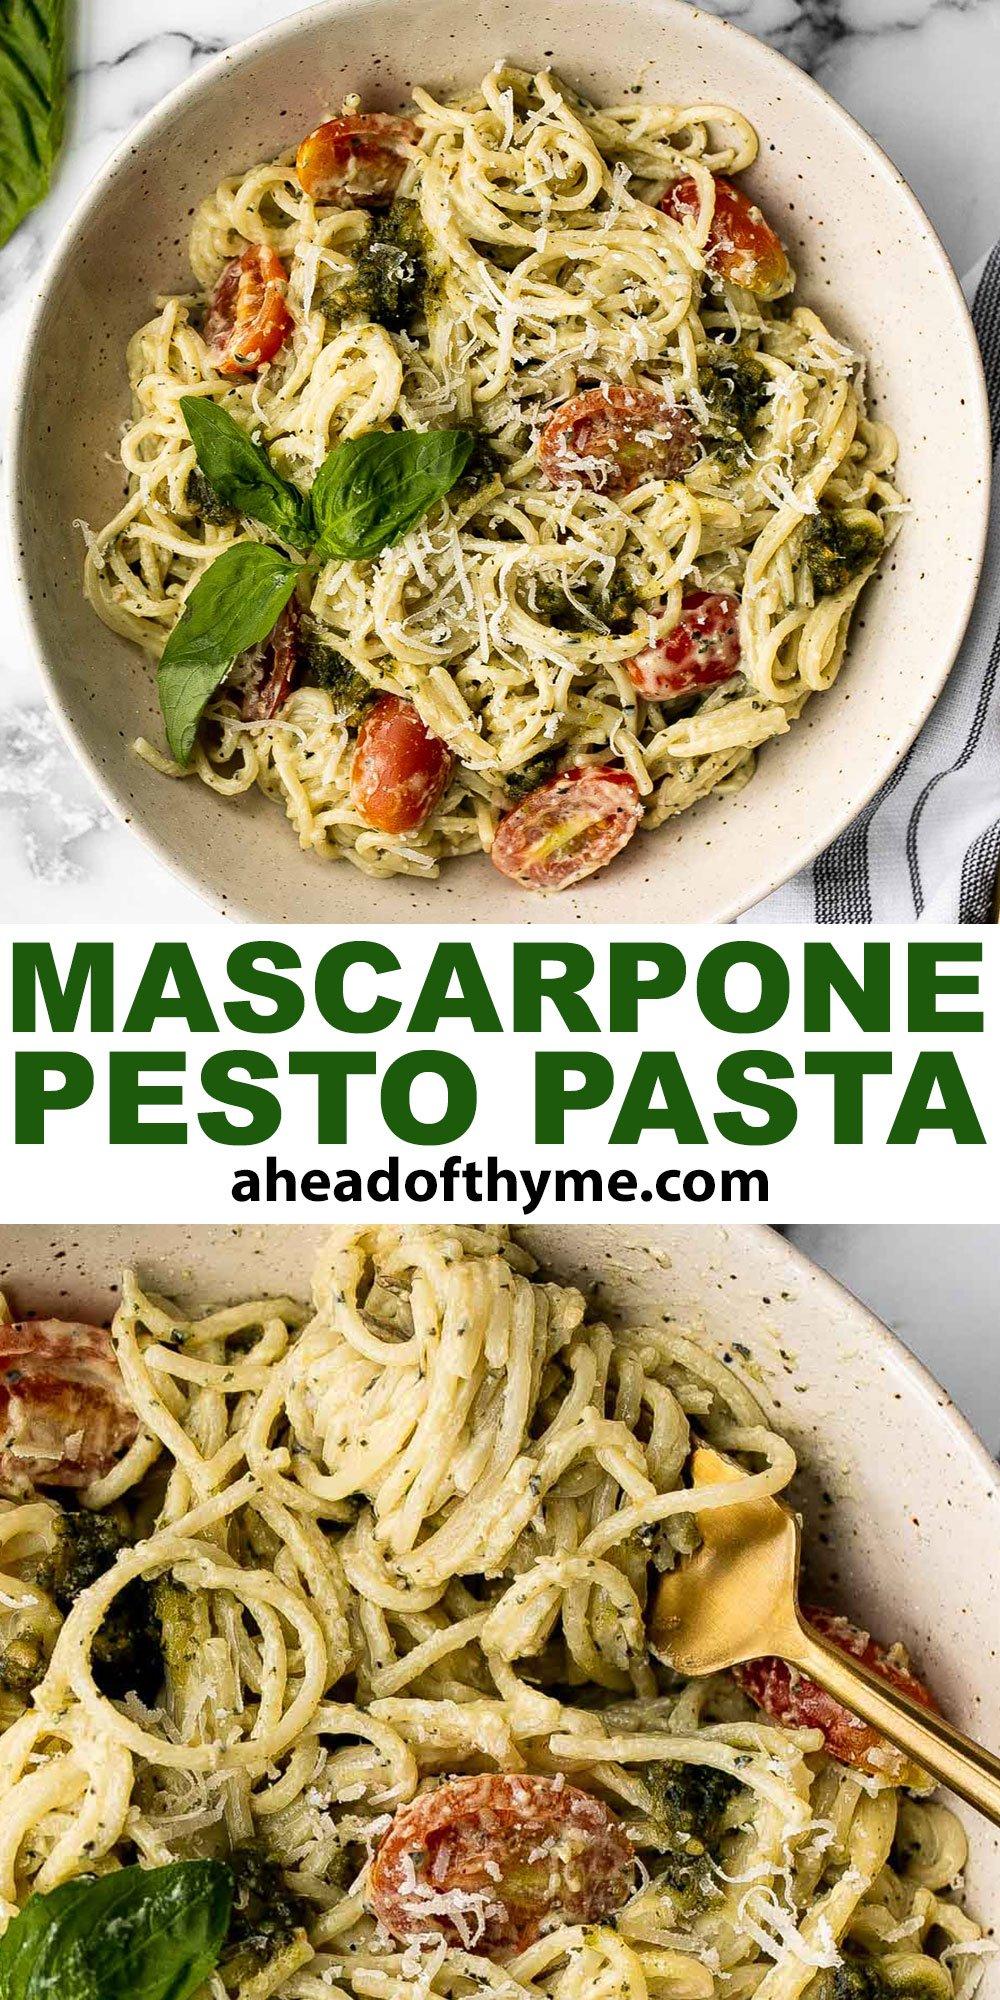 Mascarpone Pesto Pasta